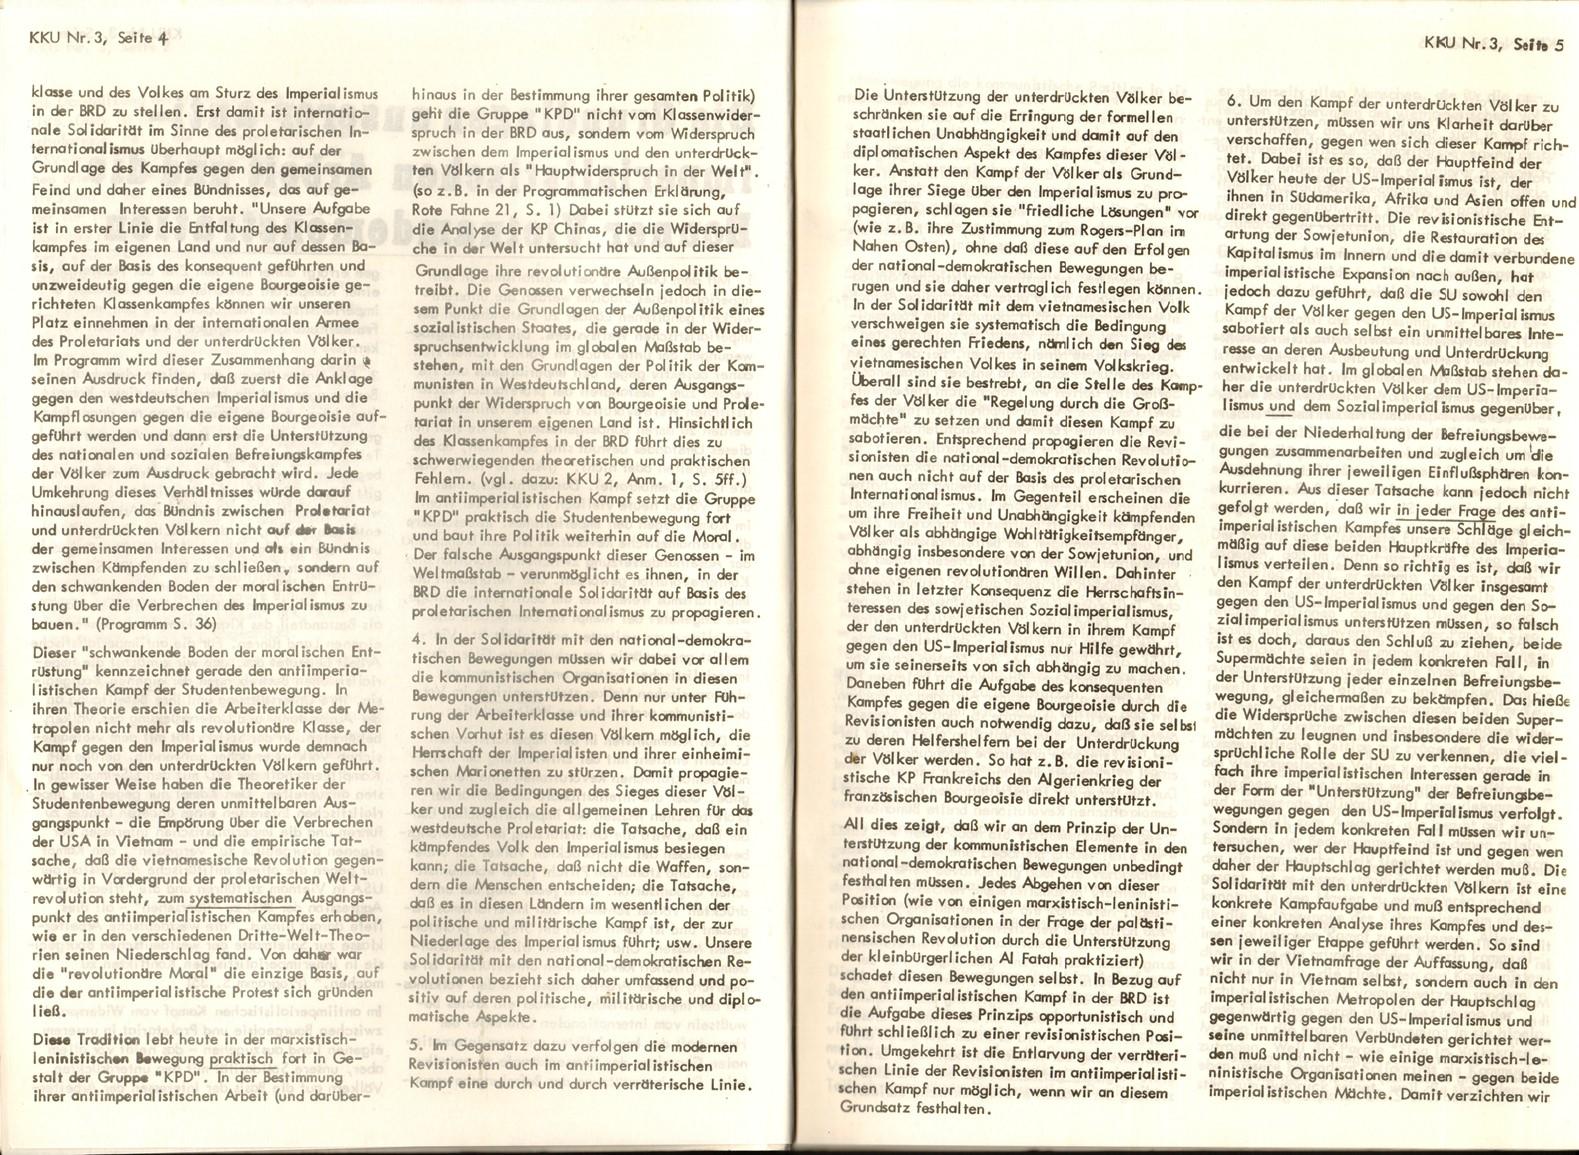 Frankfurt_Offenbach_KG_Kampf_Kritik_Umgestaltung_1973_03_04